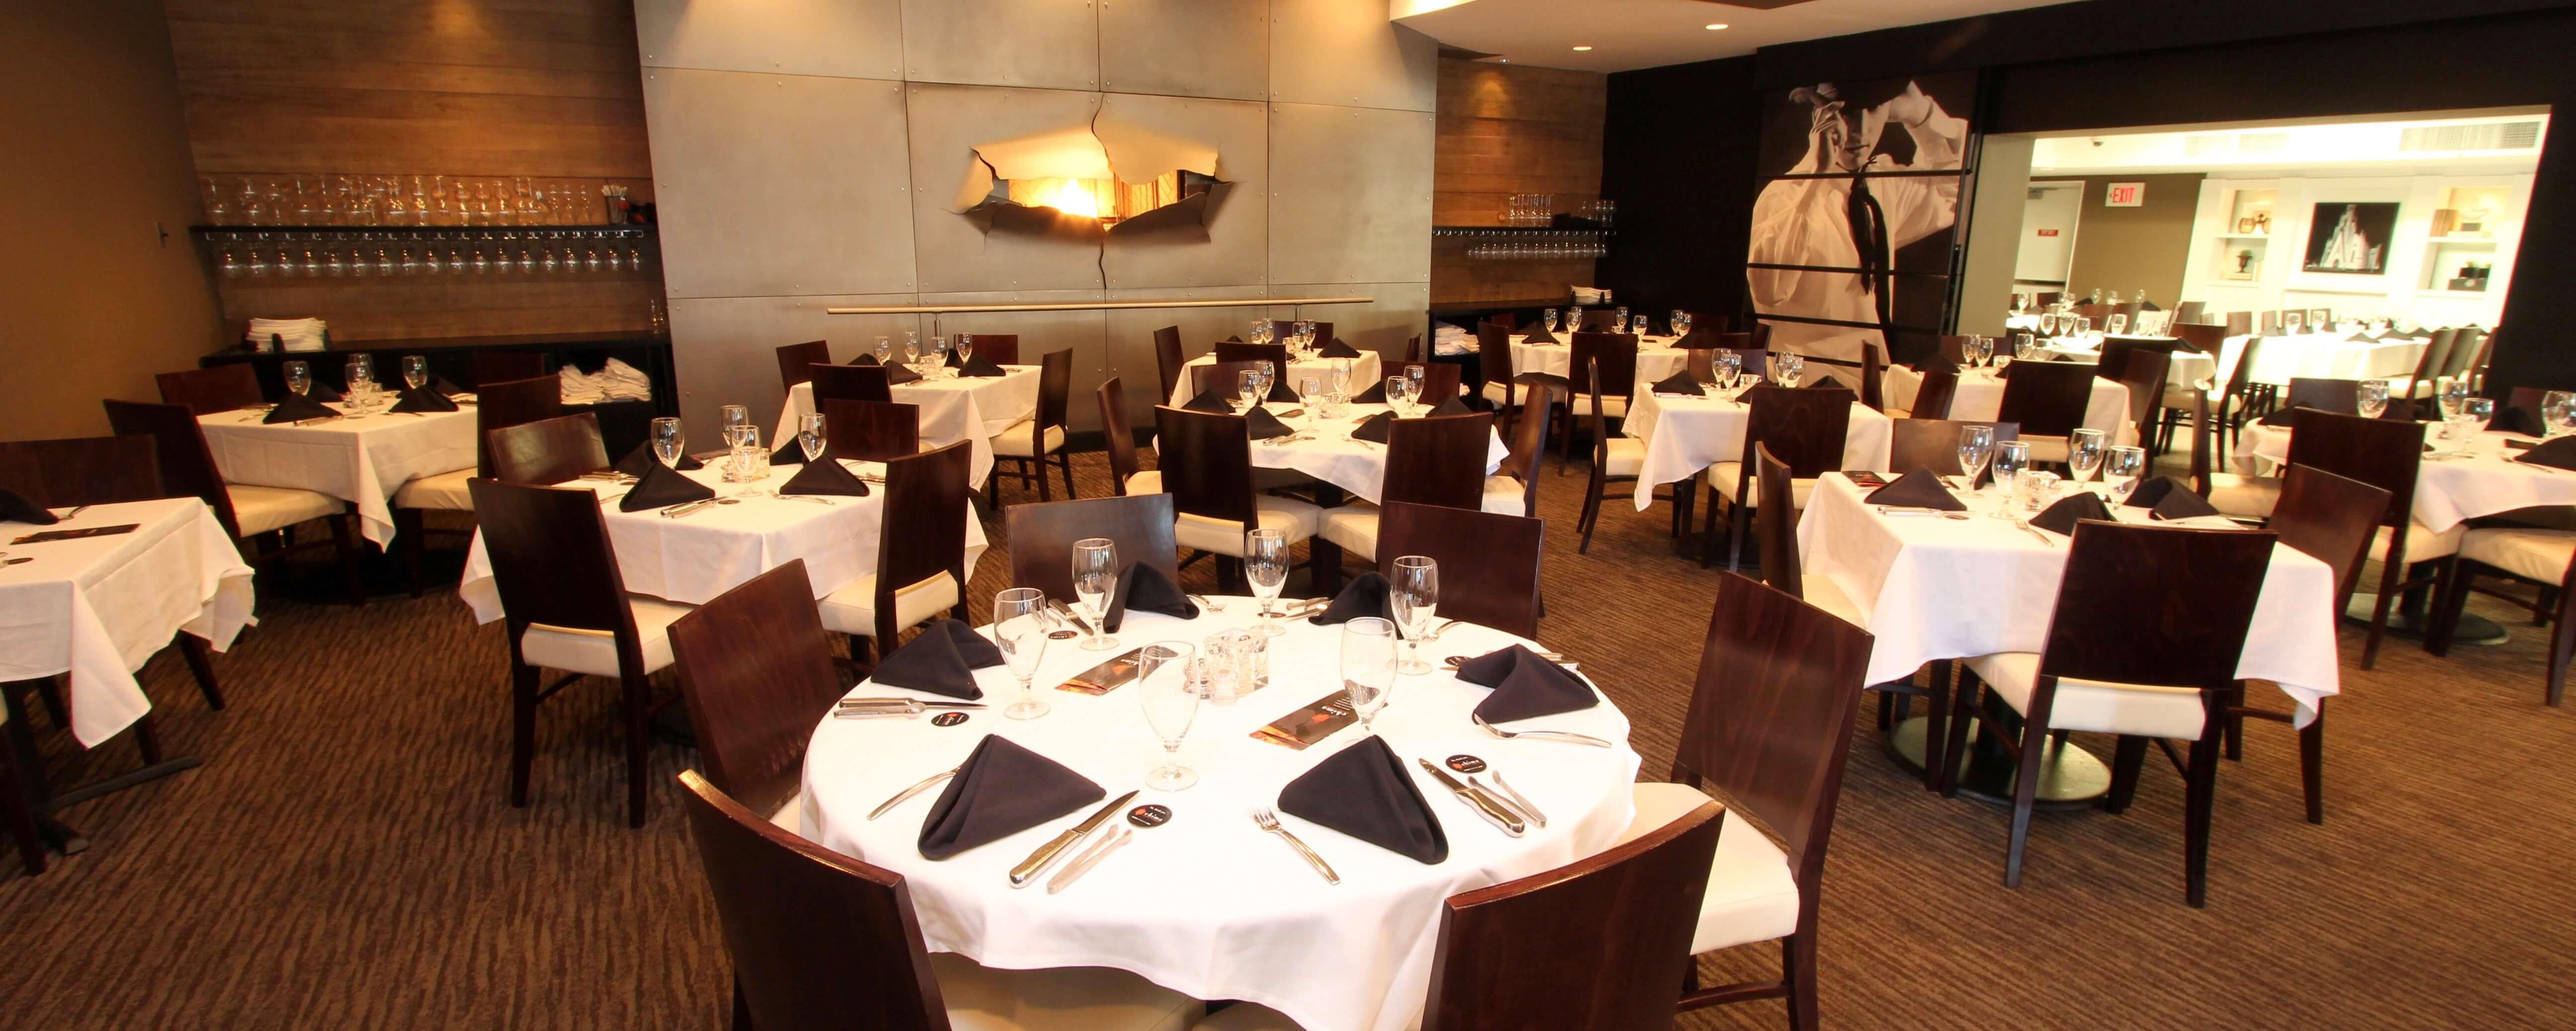 Restaurantes em Fort Lauderdale: Chima Steakhouse